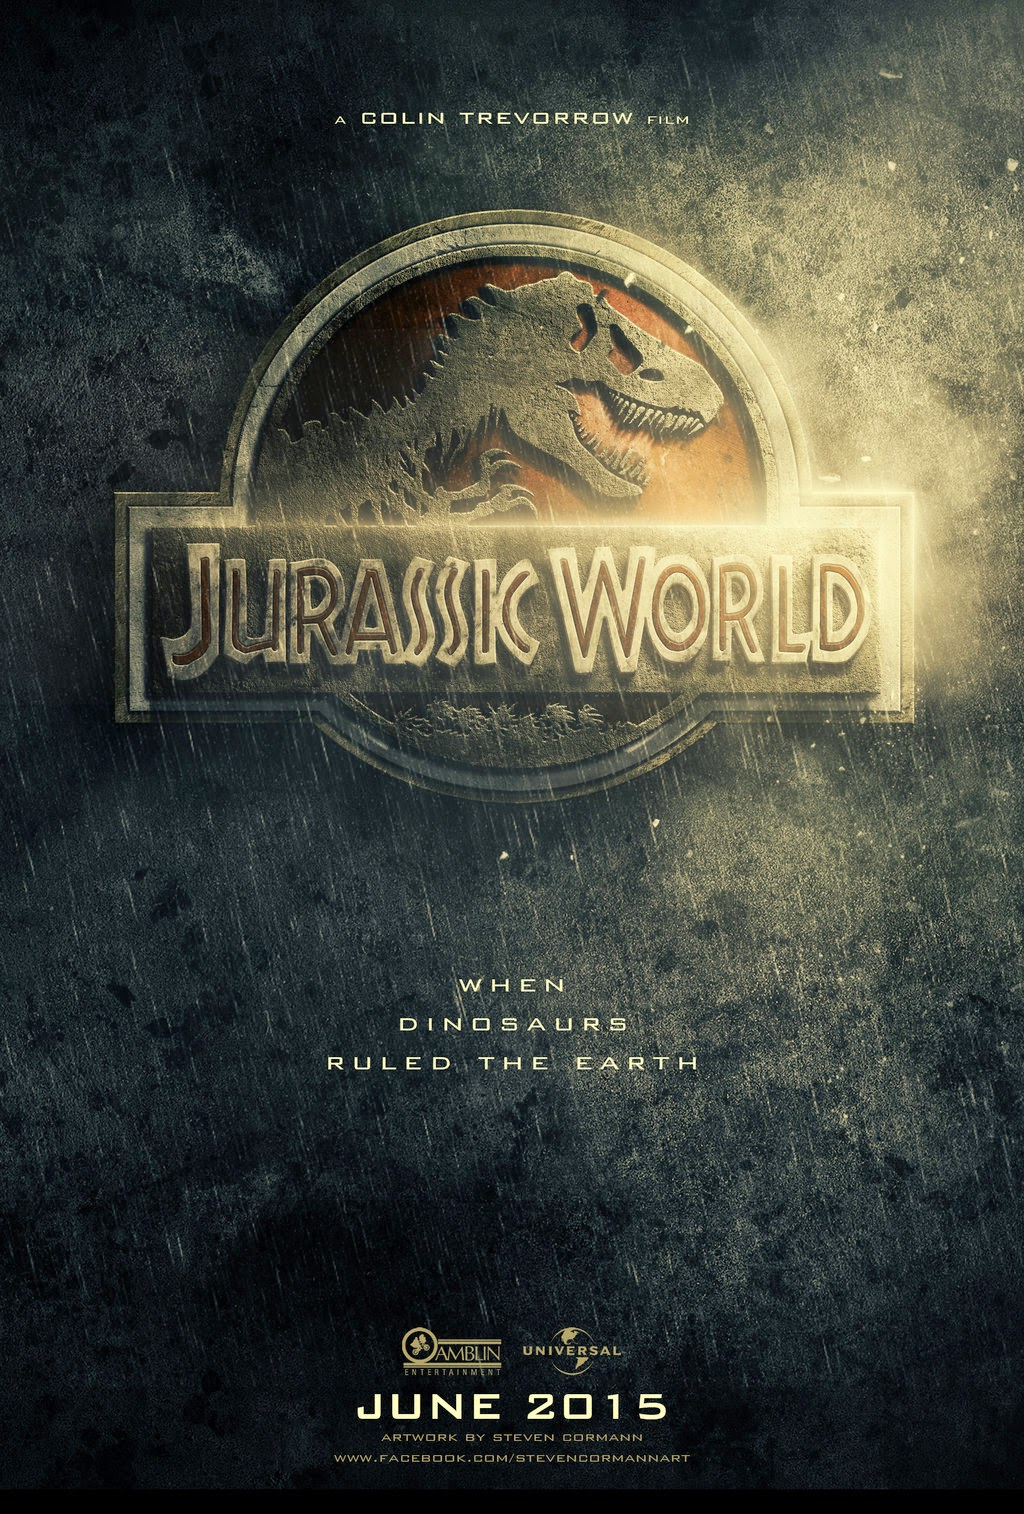 Jurassic.world.jpg